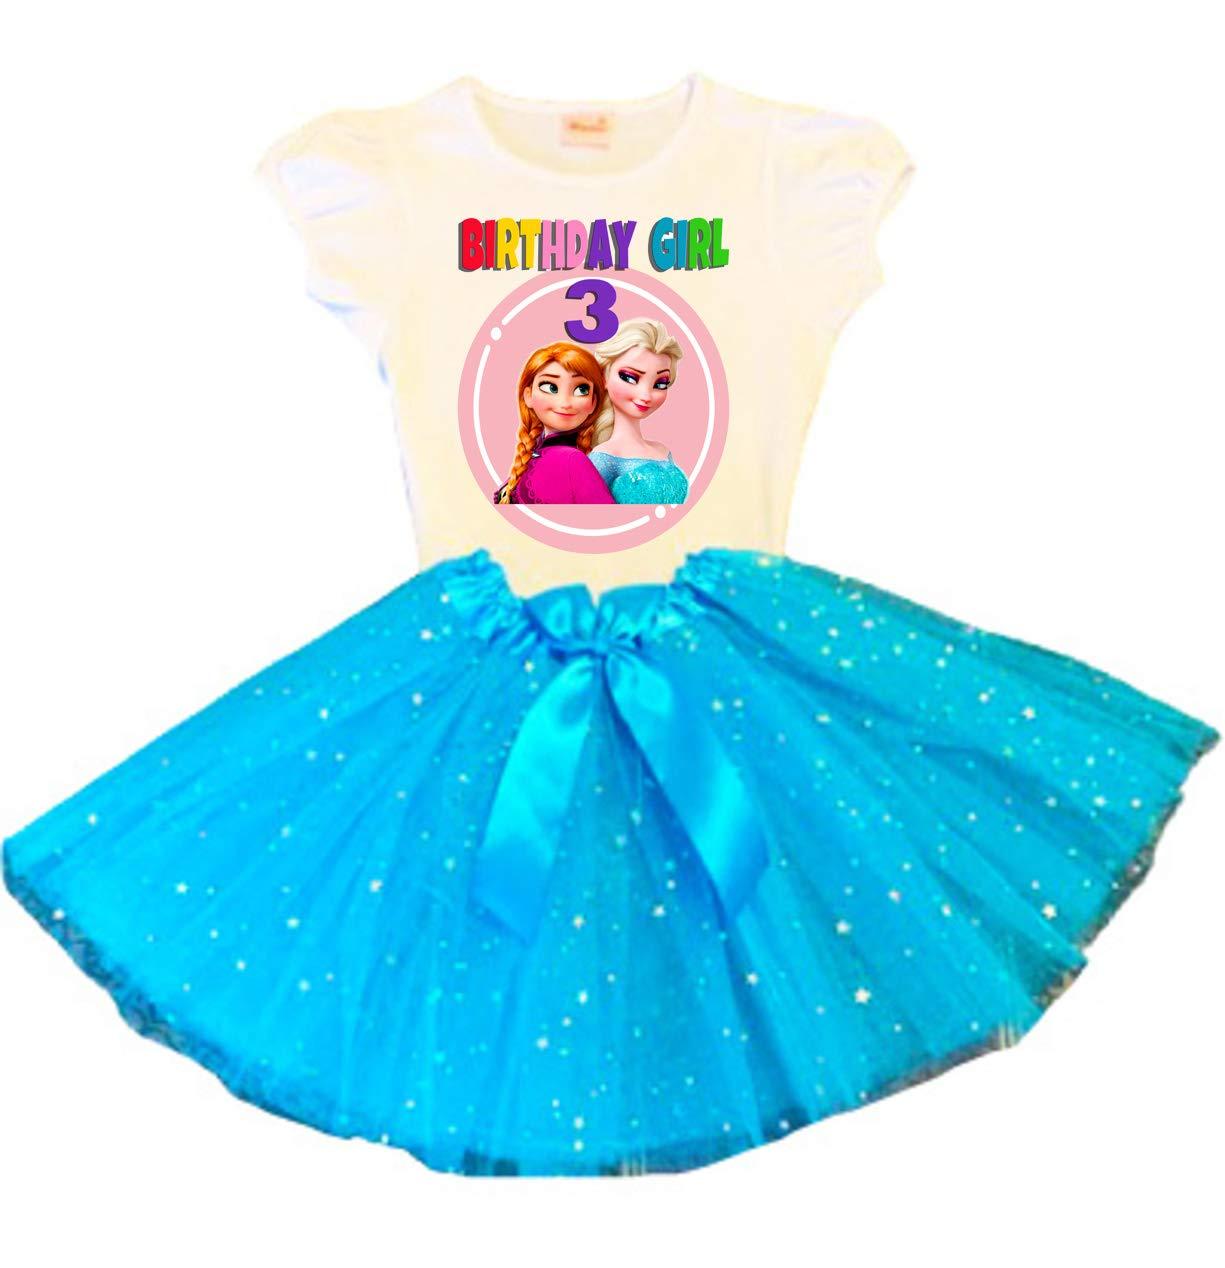 sale Frozen Elsa Anna Birthday Baltimore Mall Tutu Turquo 3rd Dress Party